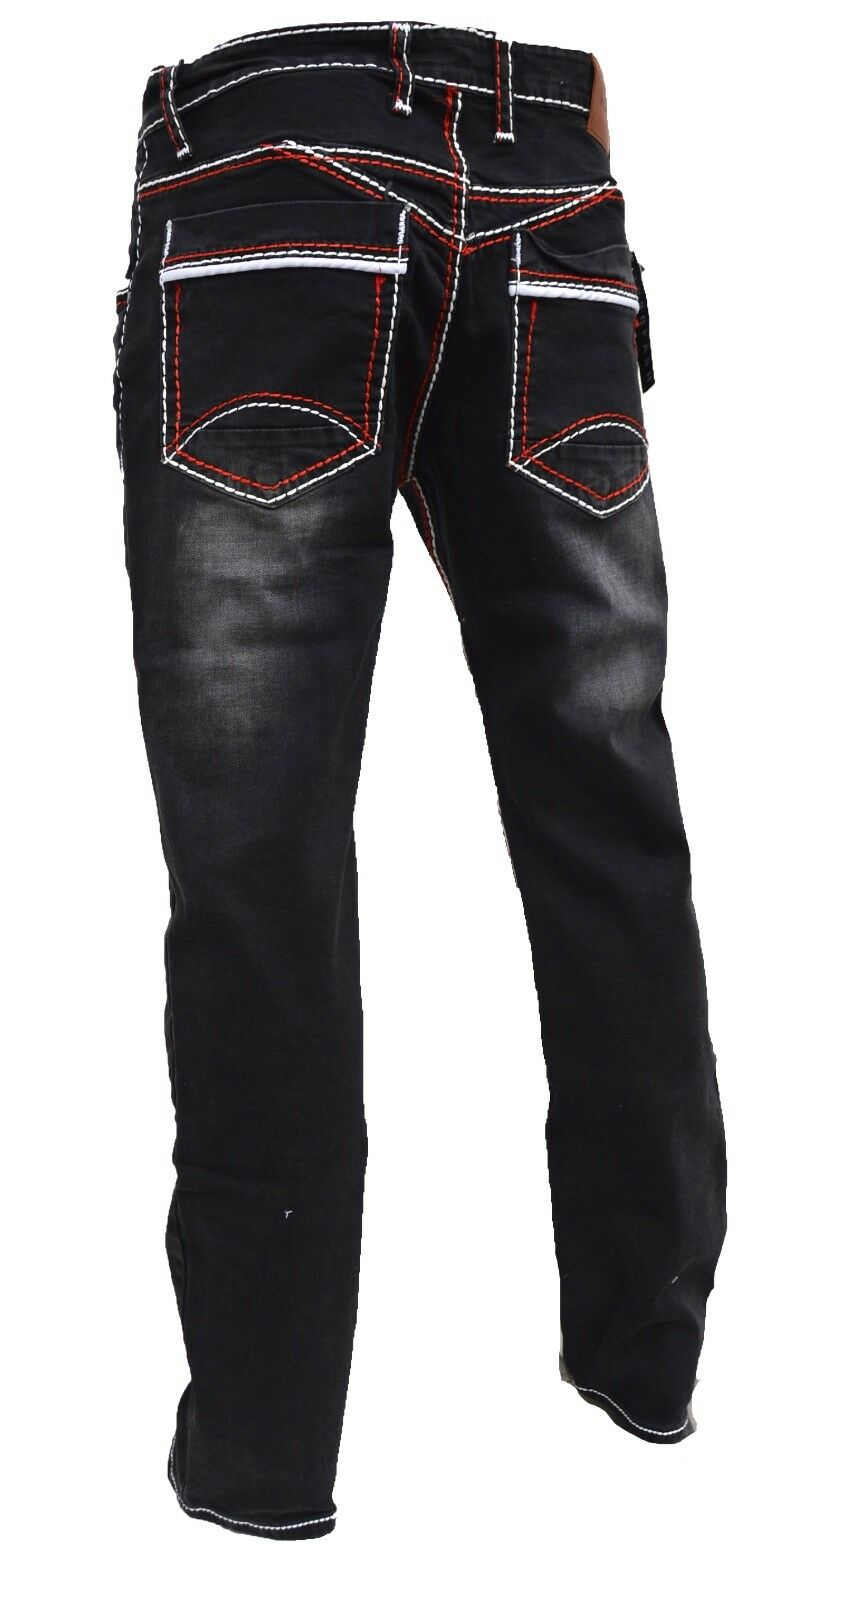 Herren-Jeans-Hose-Denim-KC-Black-Washed-Straight-Cut-Regular-Dicke-Naht-naehte Indexbild 16